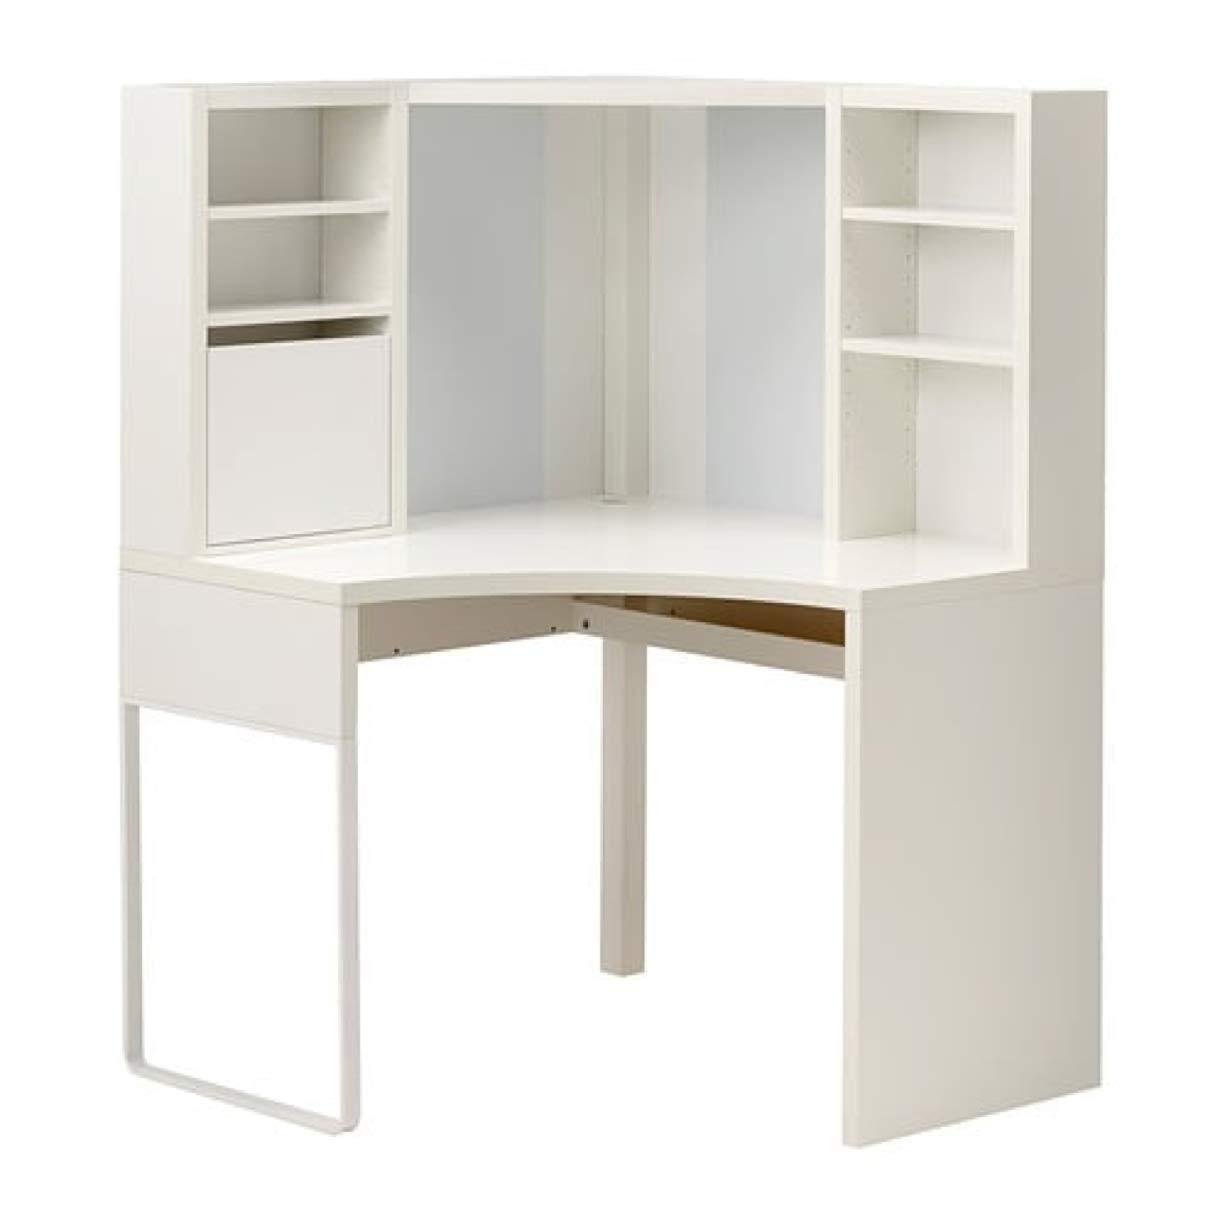 batalla Legítimo anillo  IKEA Micke 502.507.13 - Estación de trabajo de esquina, color blanco, talla  39 3/8 x 55 7/8 pulgadas: Amazon.es: Hogar